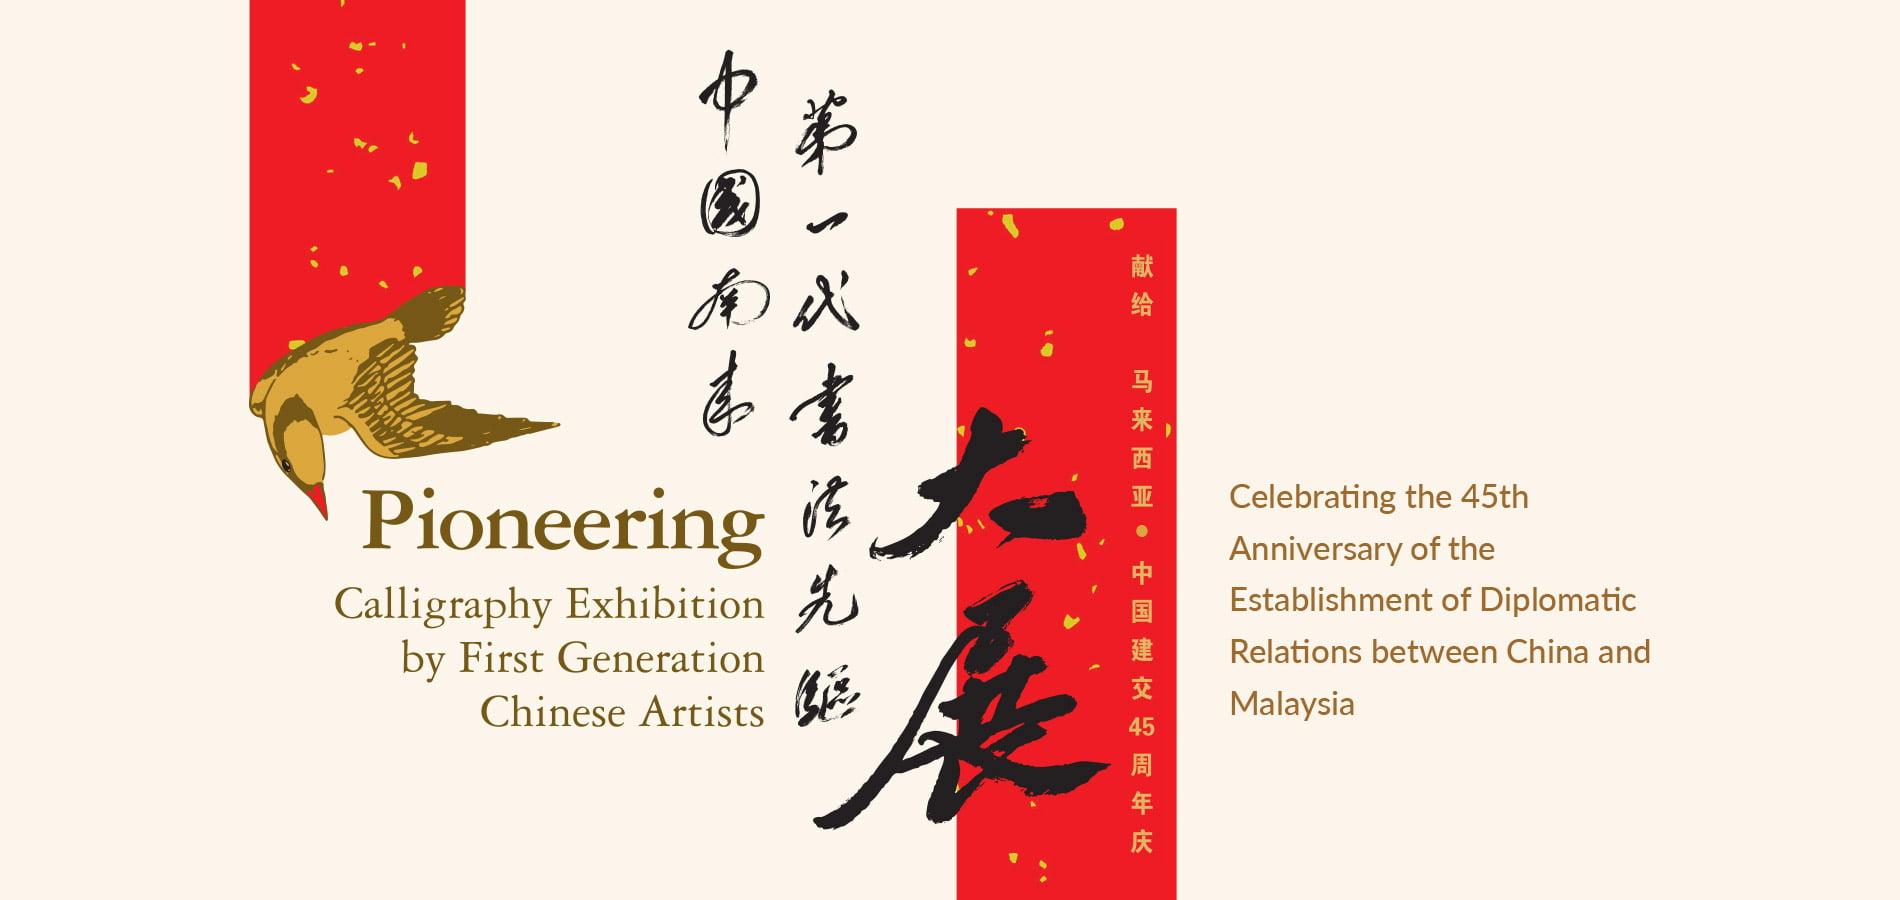 Pioneering Calligraphy Exhibition